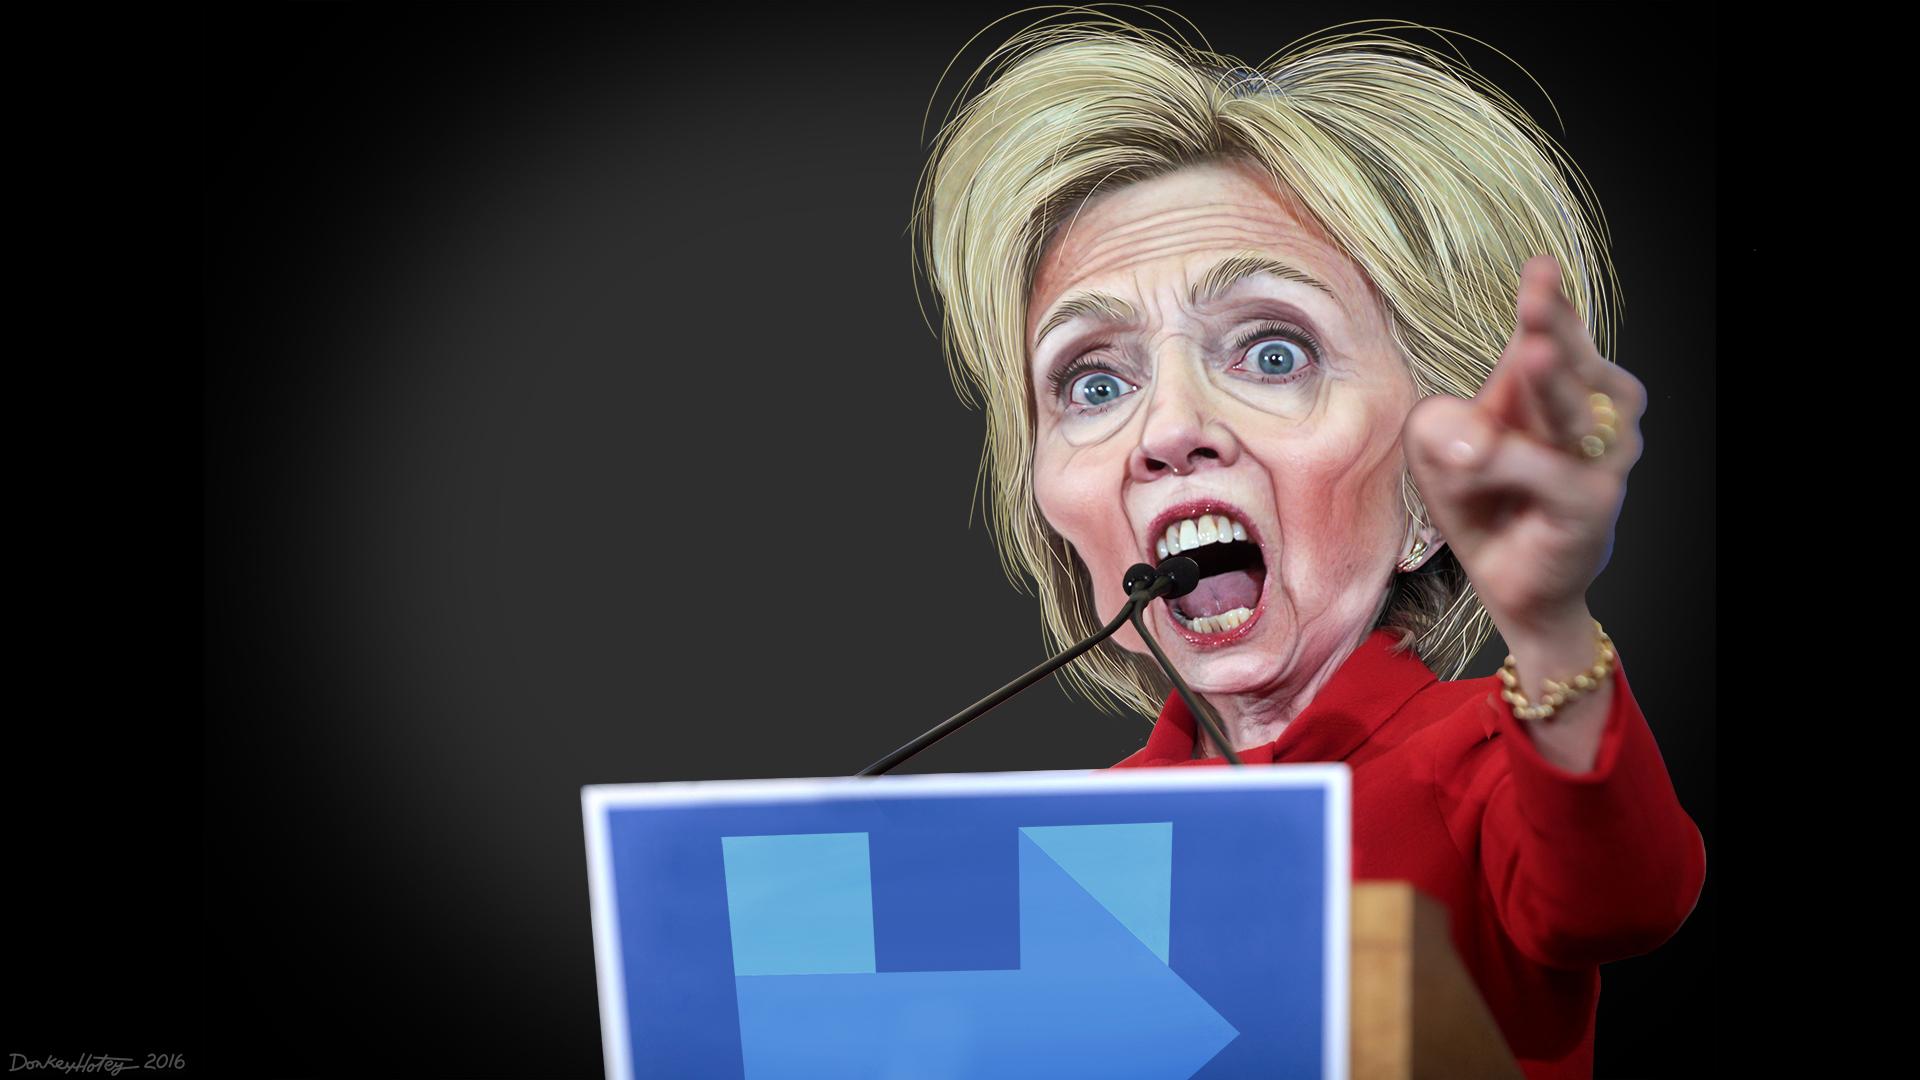 Hillary_Clinotn_Caricature_1920x1080.jpg